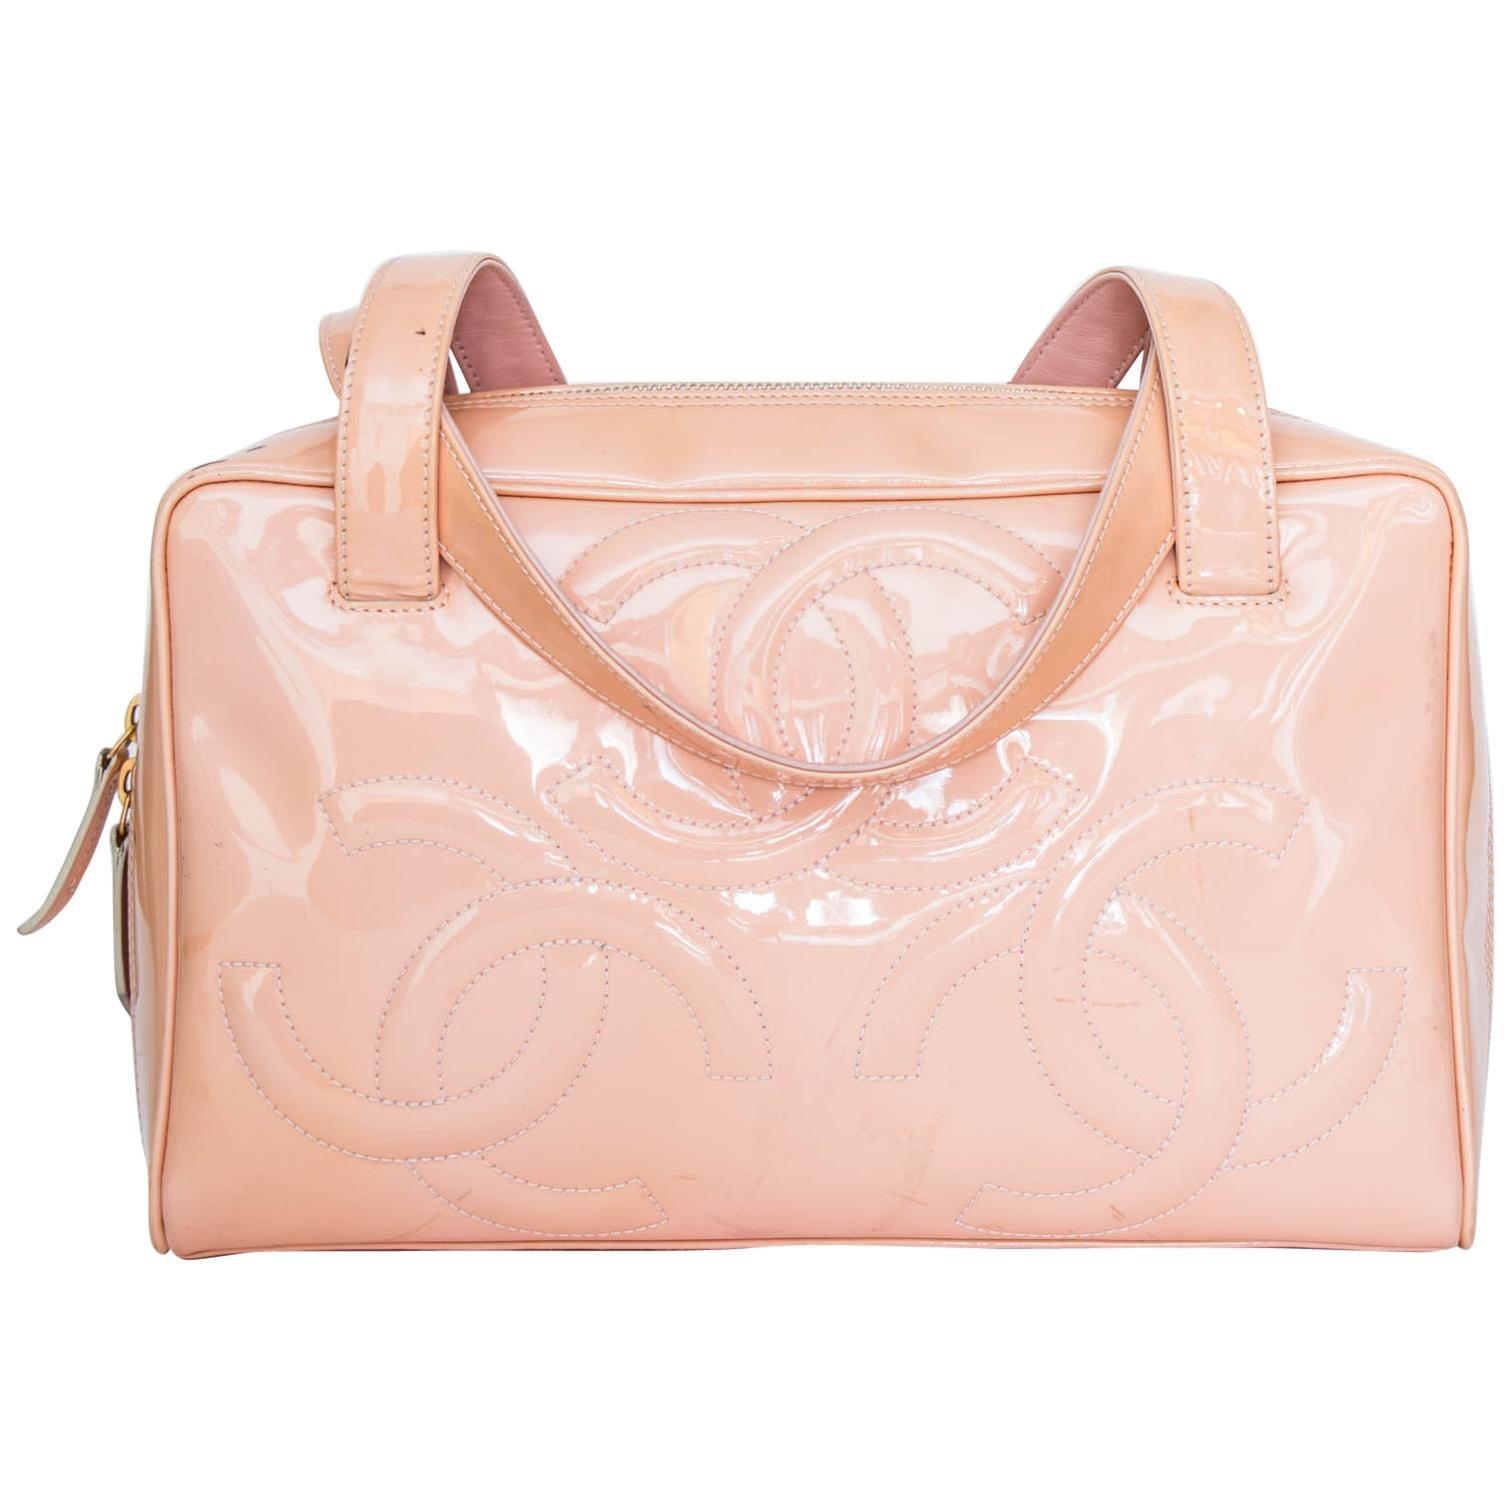 9fa153614a35 Stunning Chanel Black Lambskin Gold Chain Handbag For Sale at 1stdibs